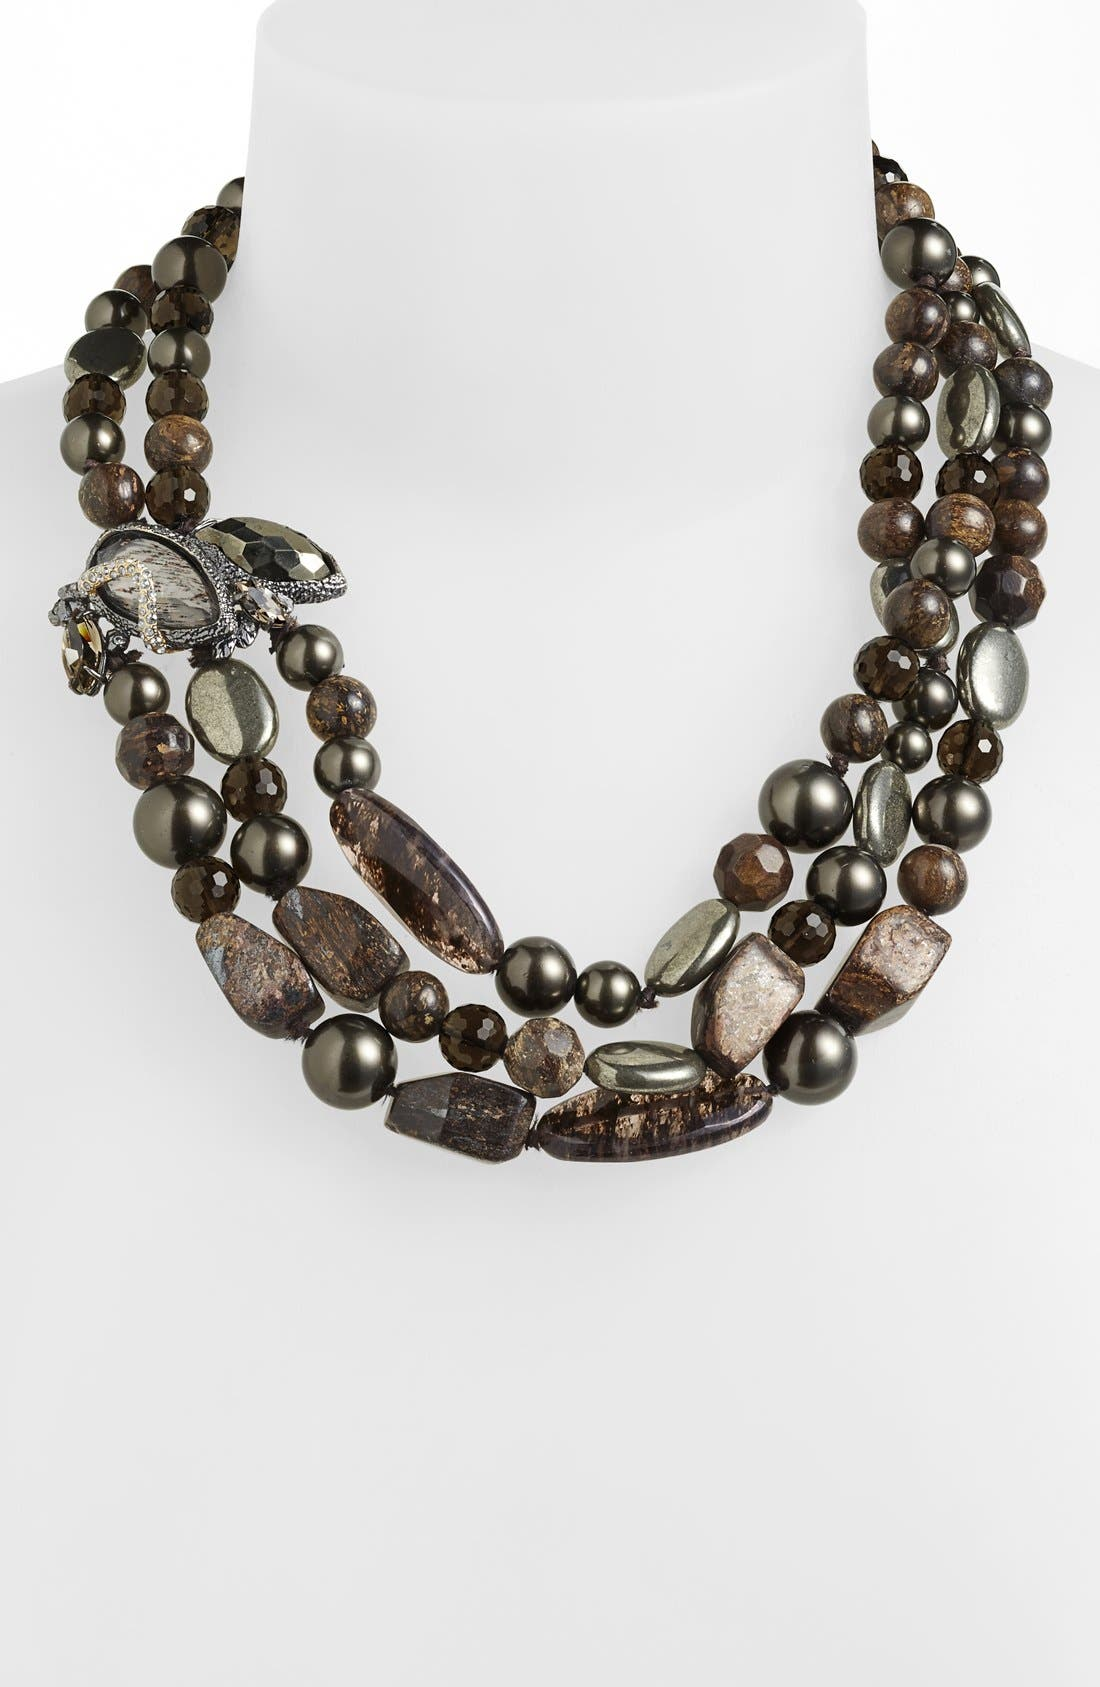 Alternate Image 1 Selected - Alexis Bittar 'Elements - Dark Phoenix' Multistrand Necklace